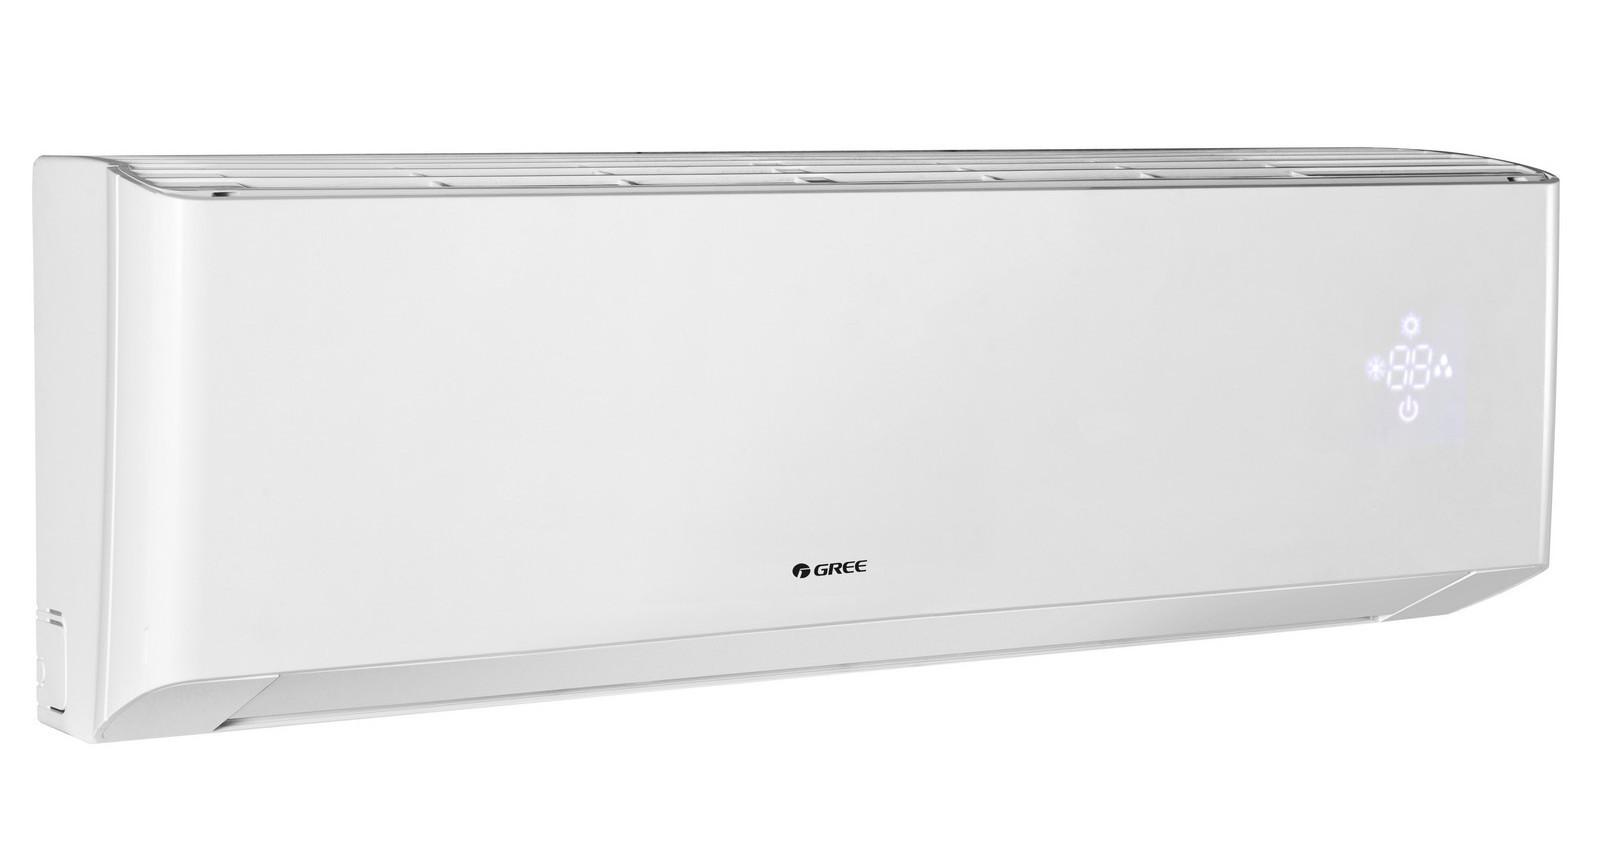 Gree GWH12YD-S6DBA2A Amber Premium Inverter WiFi klima 12k